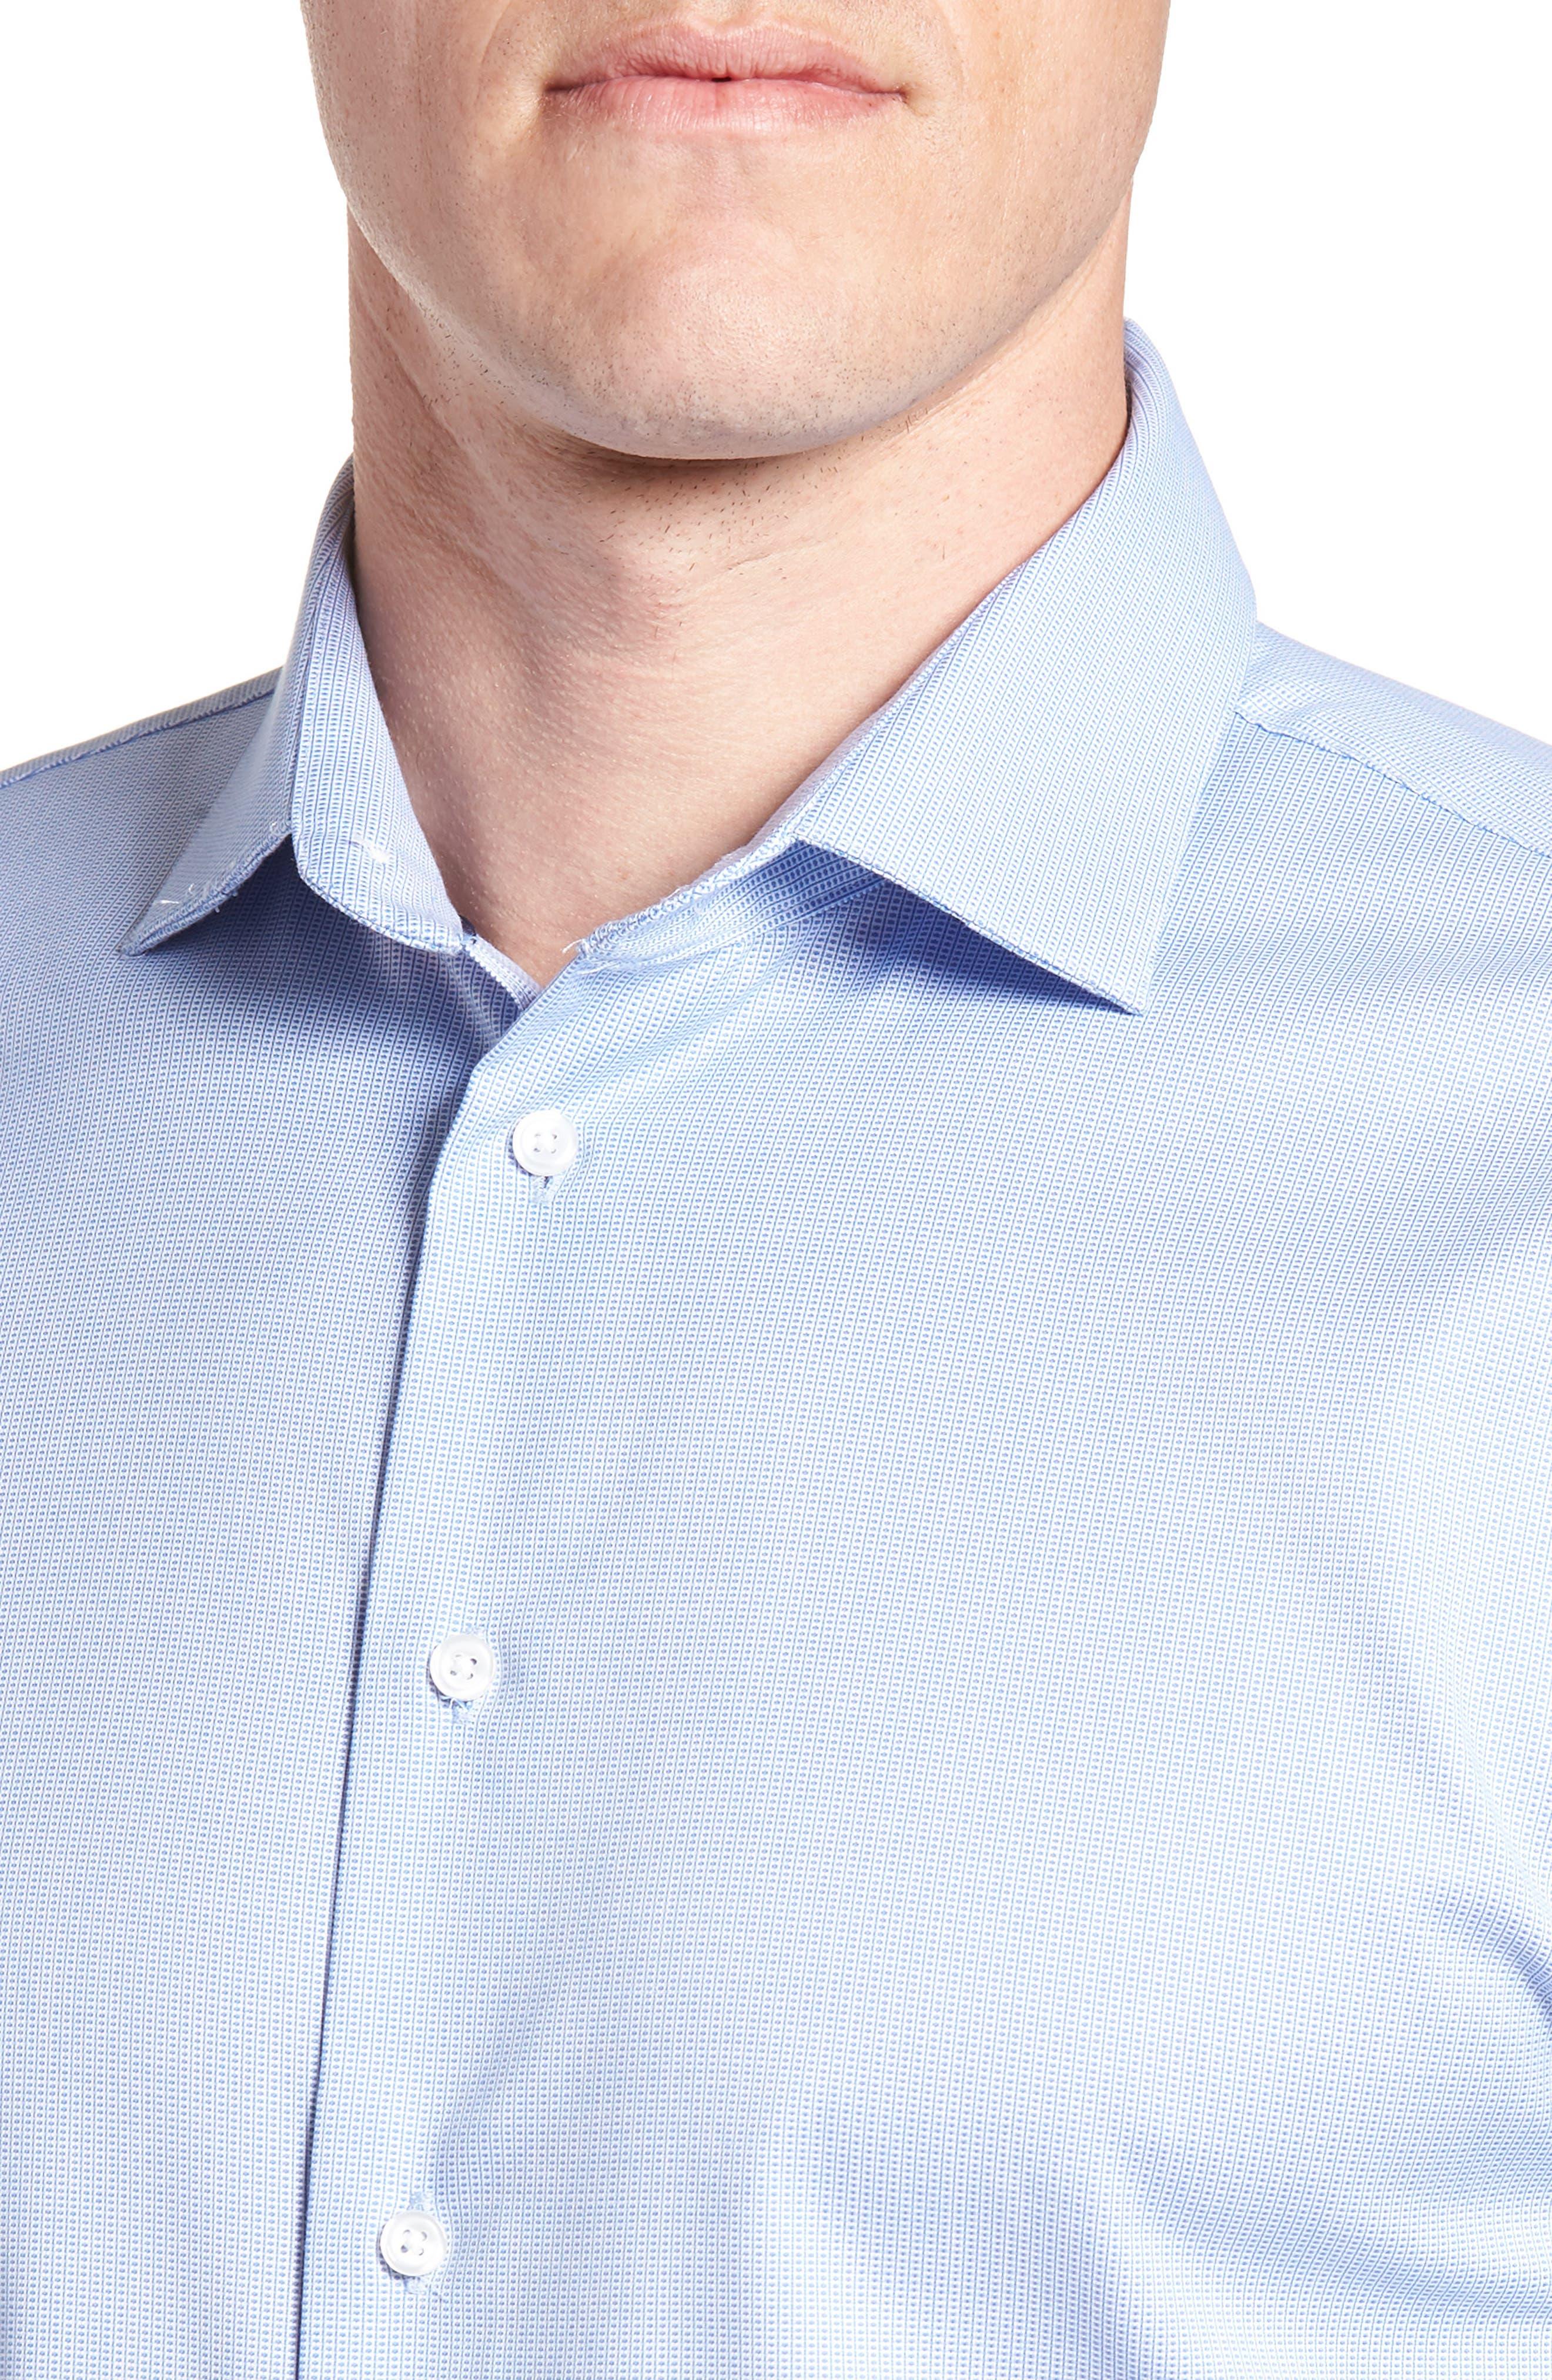 Trim Fit Non-Iron Stretch Dress Shirt,                             Alternate thumbnail 2, color,                             Blue Azurite